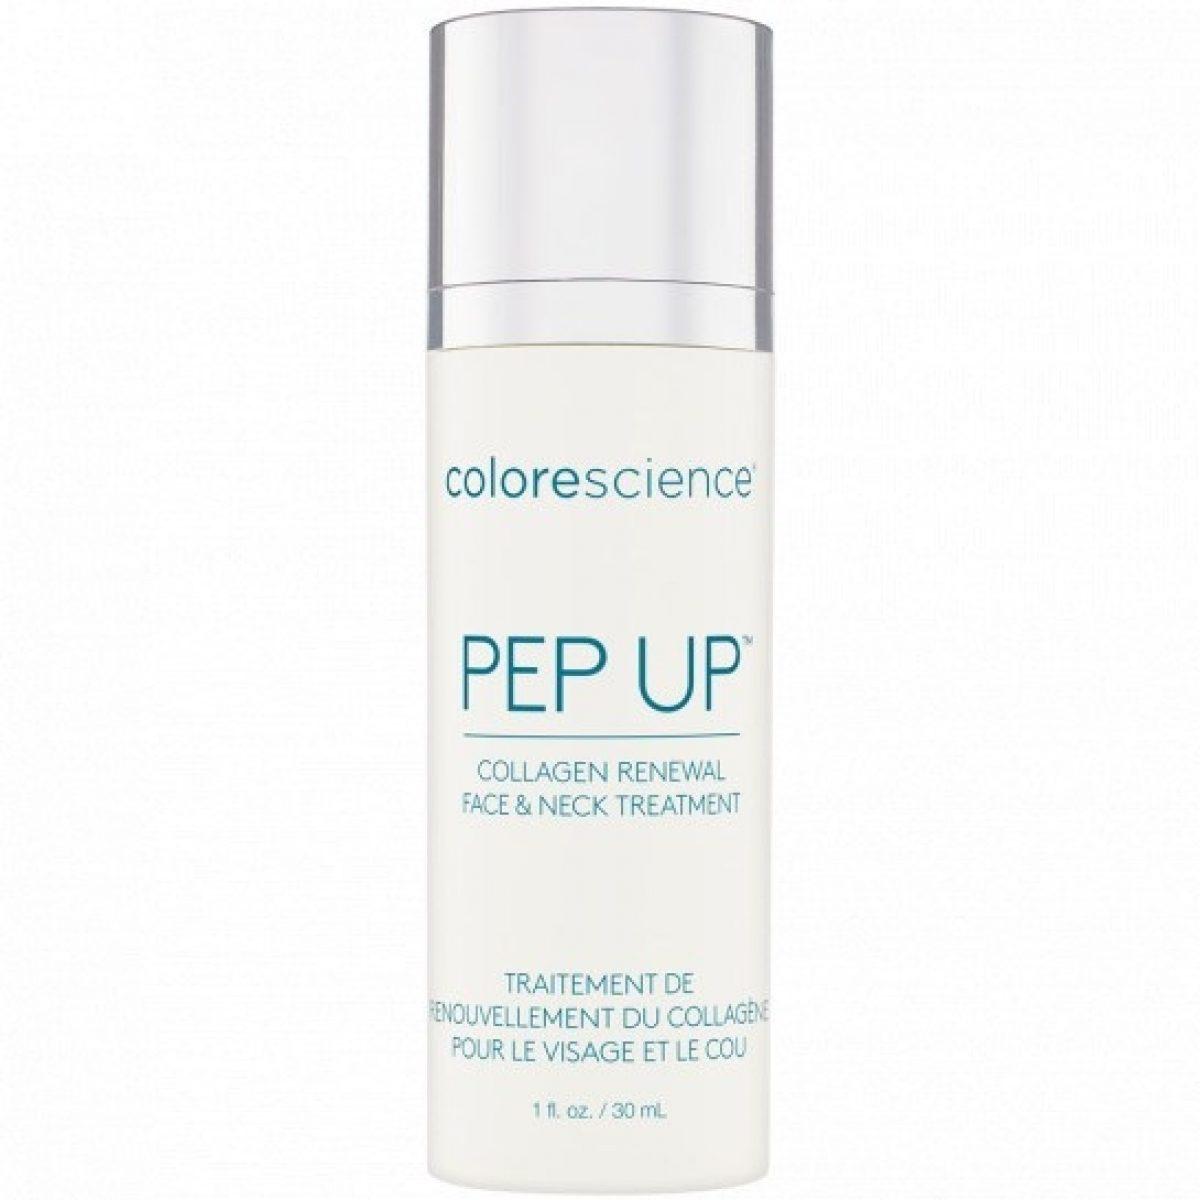 Pep Up™ Collagen Renewal Face & Neck Treatment